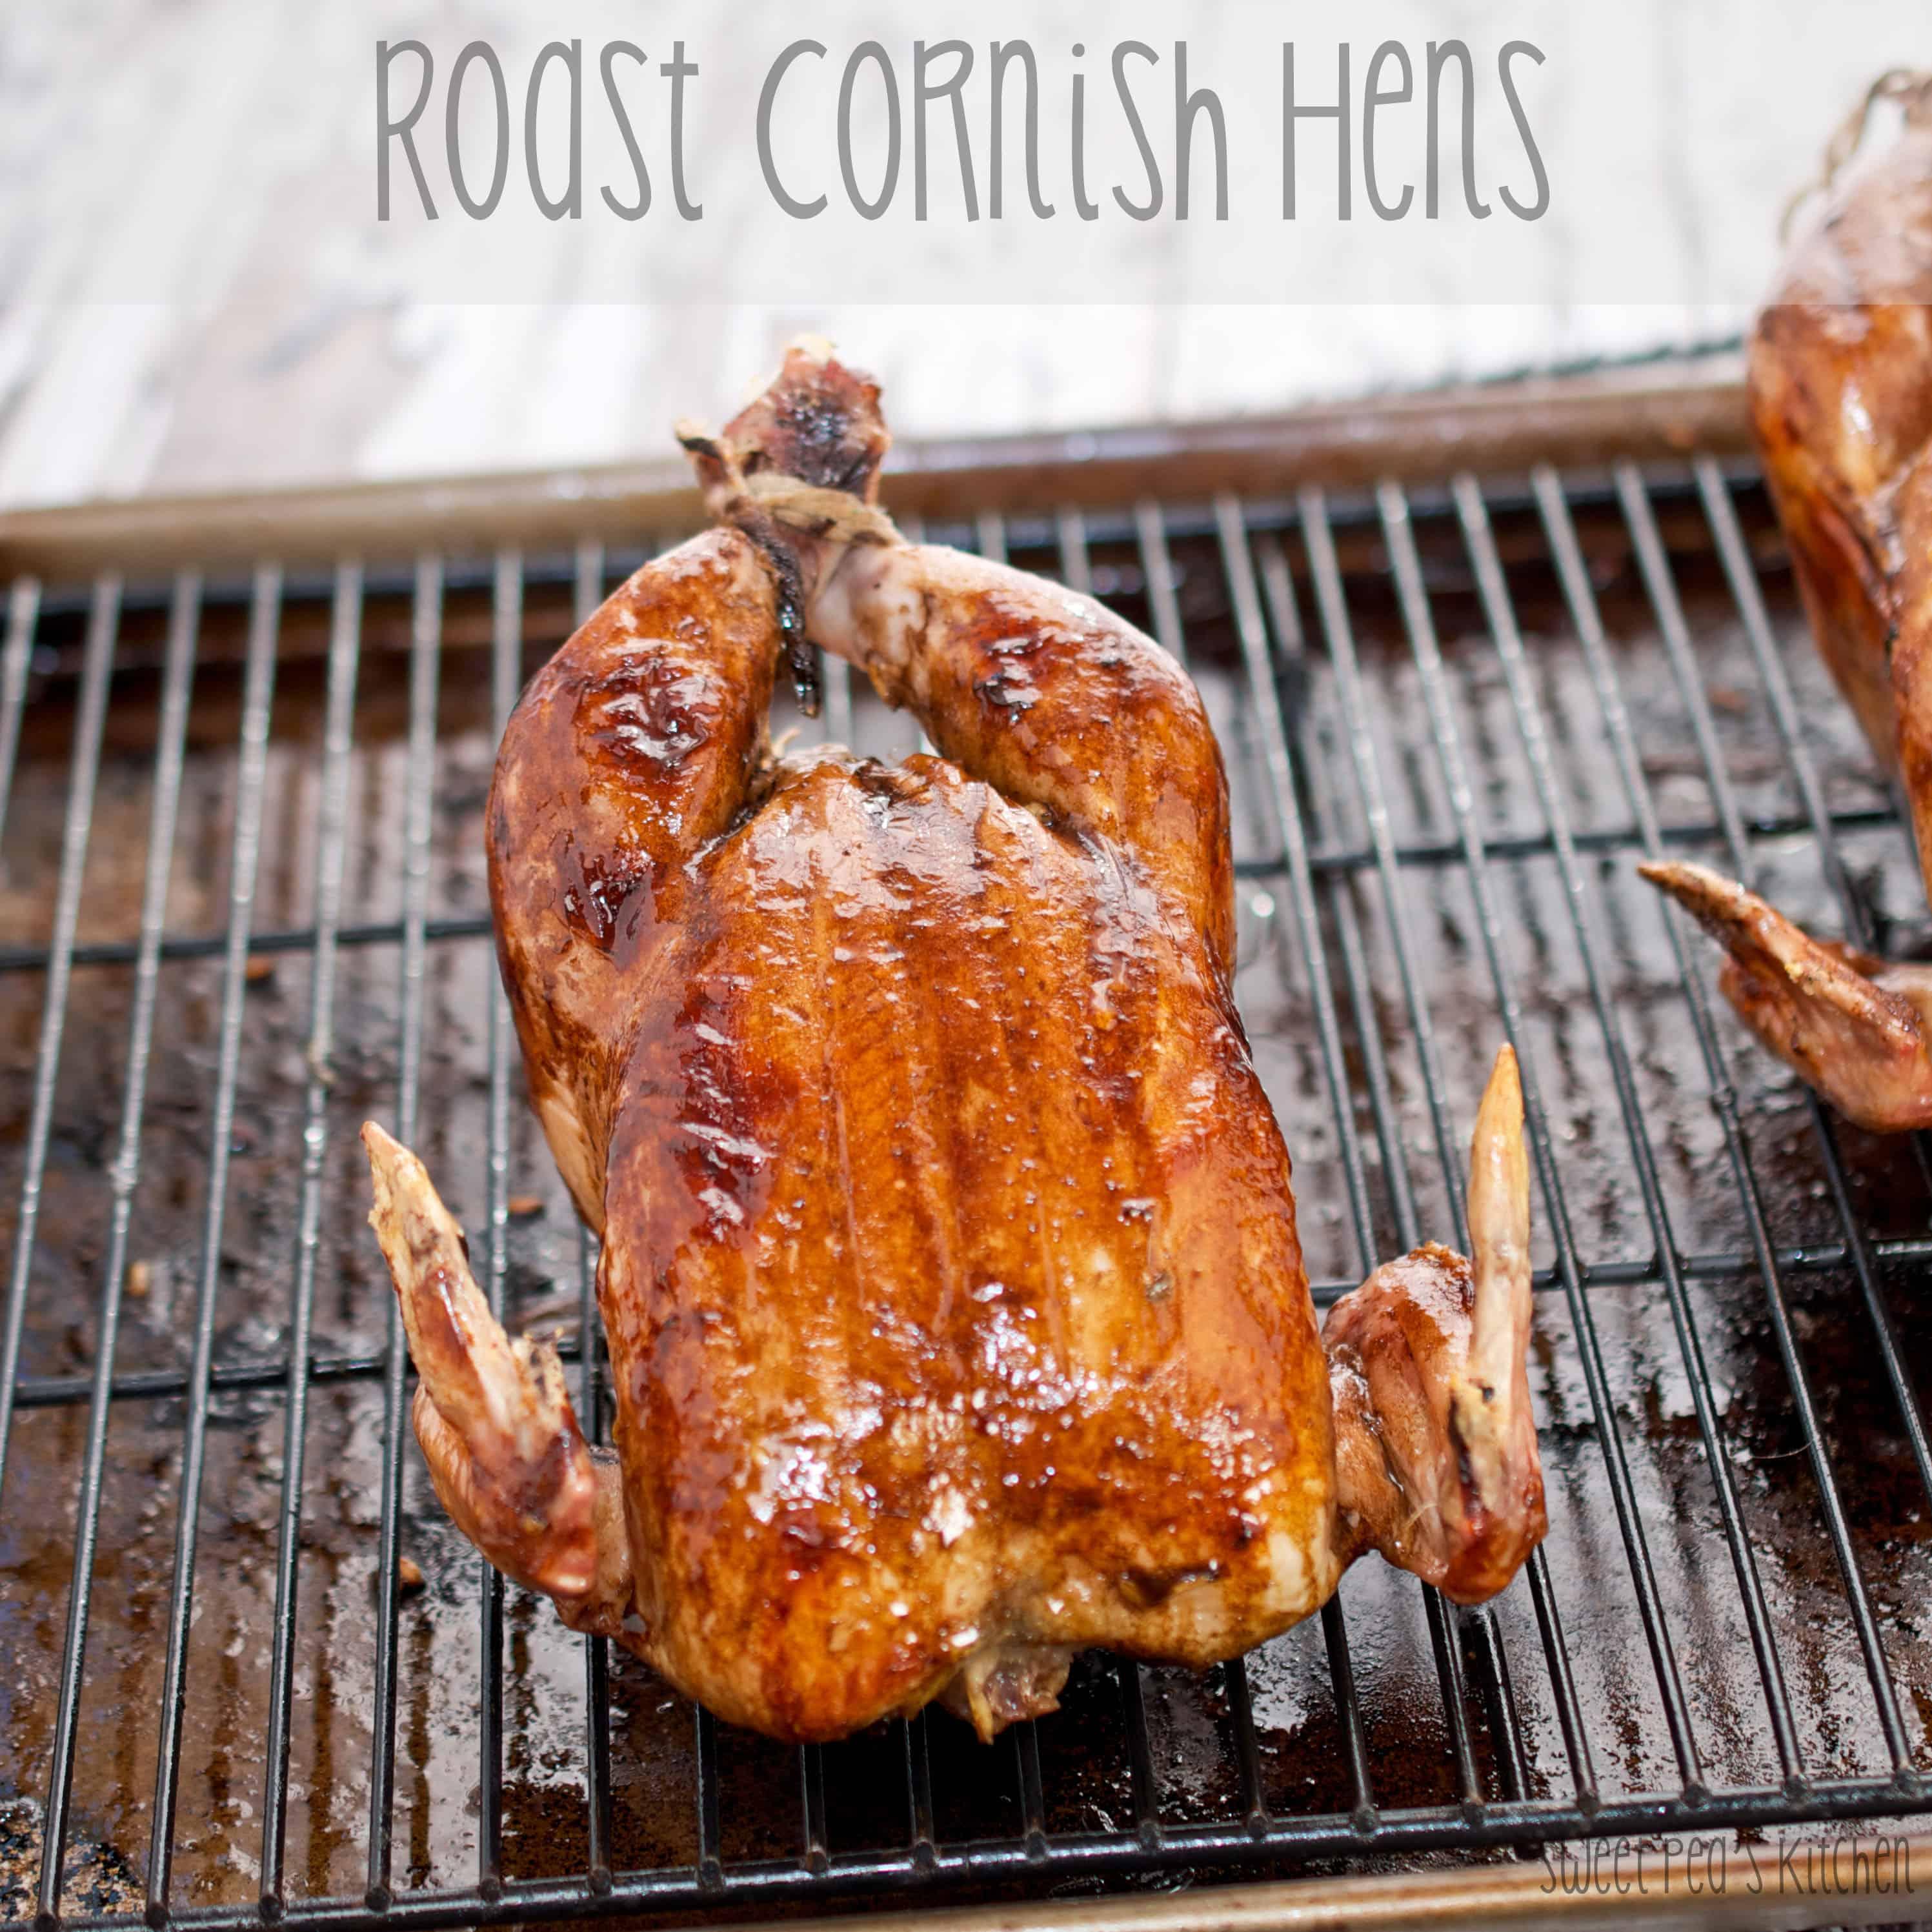 cornish hen ready to serve